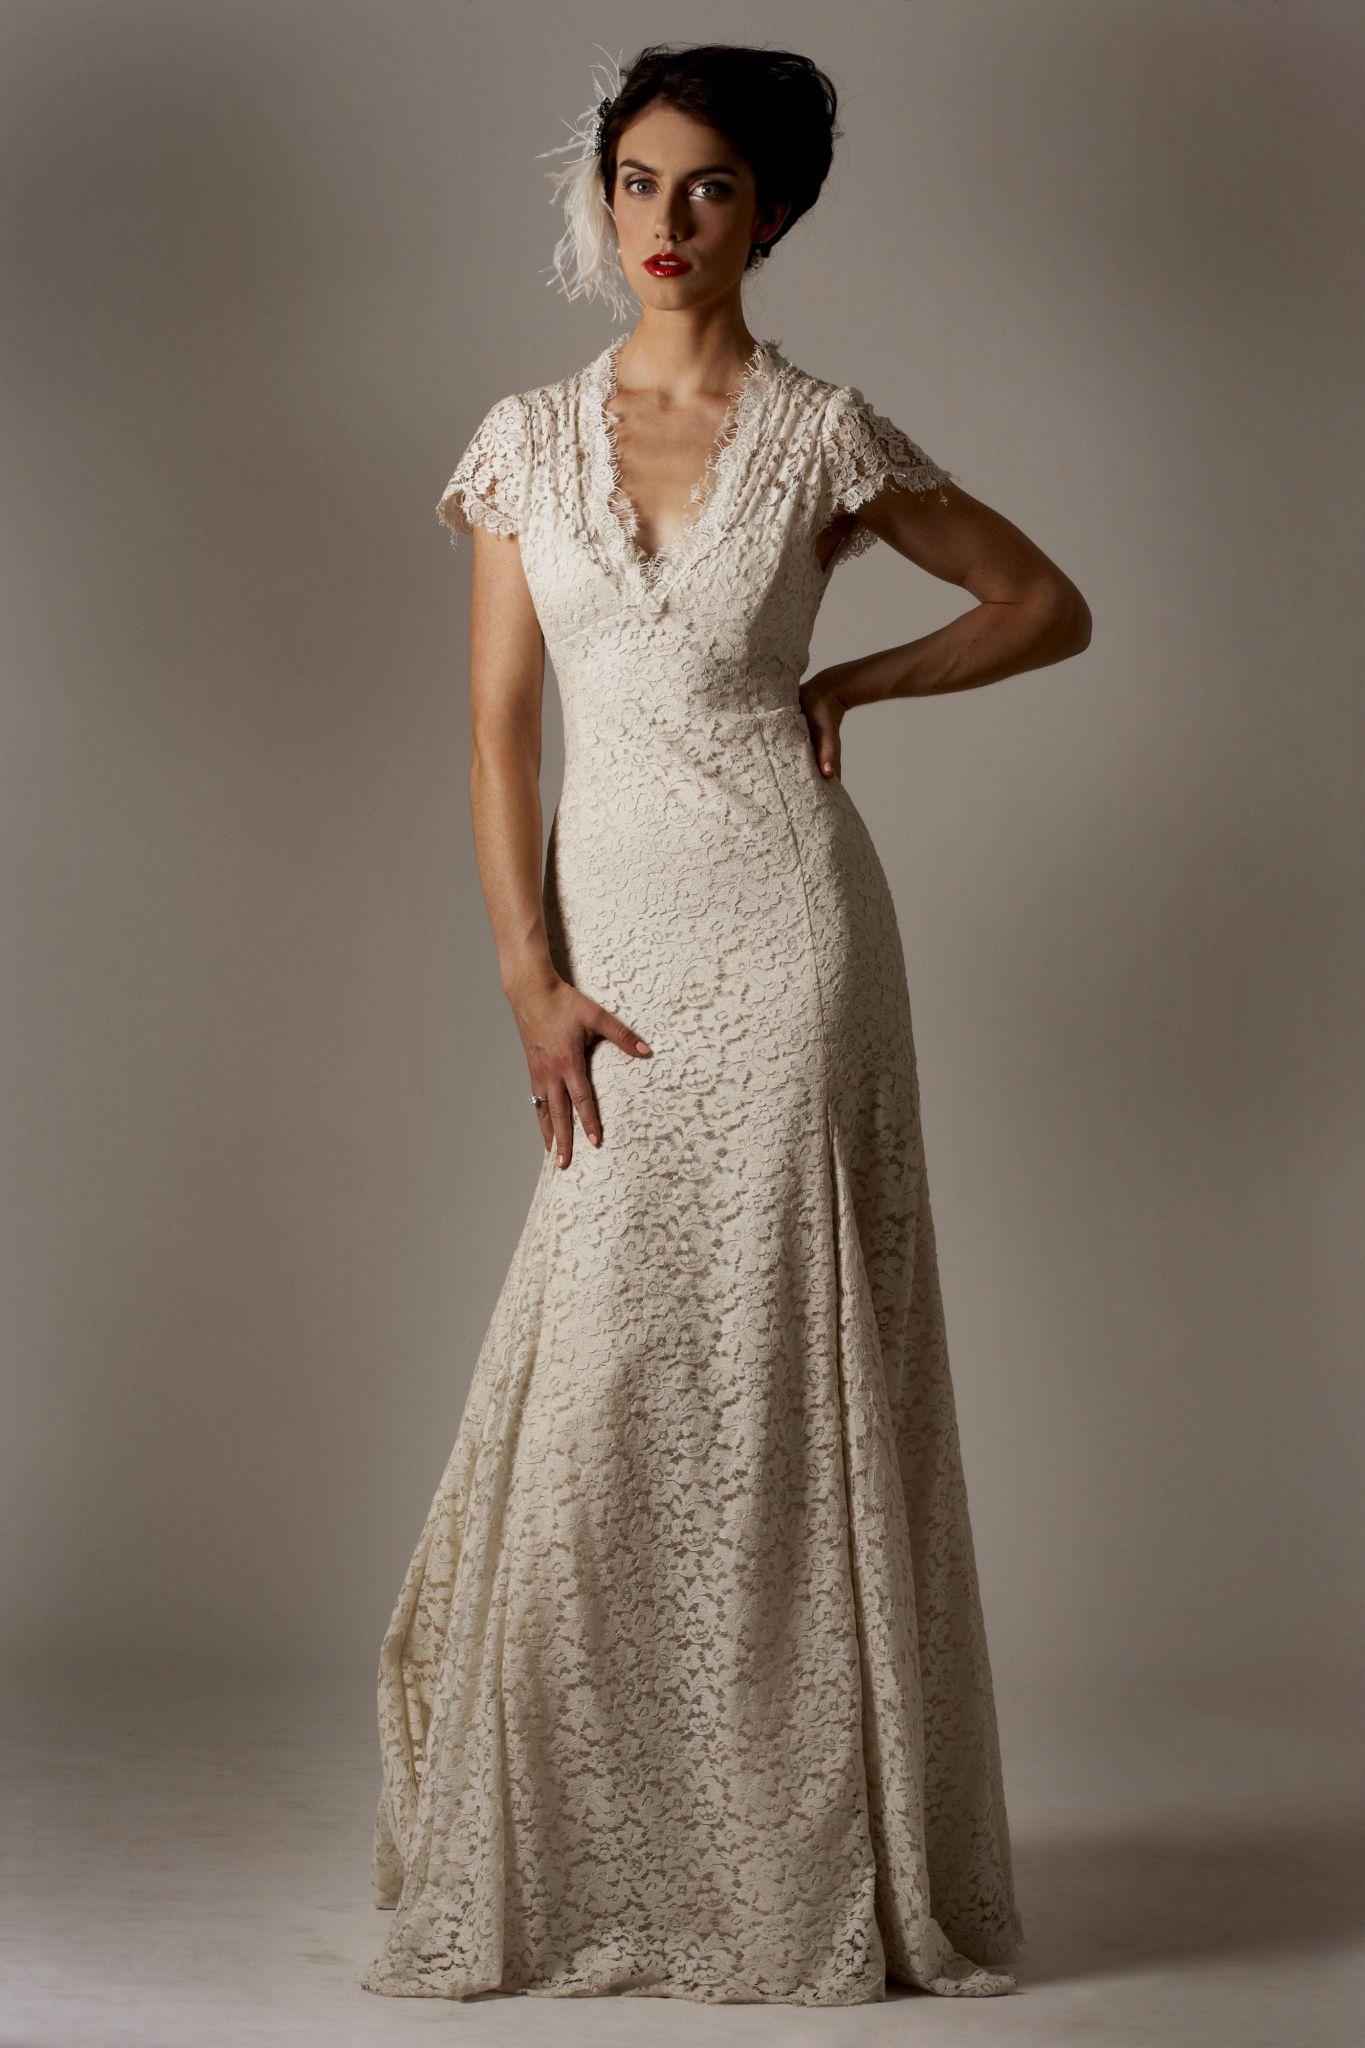 Casual Wedding Dresses for Older Brides Plus Size